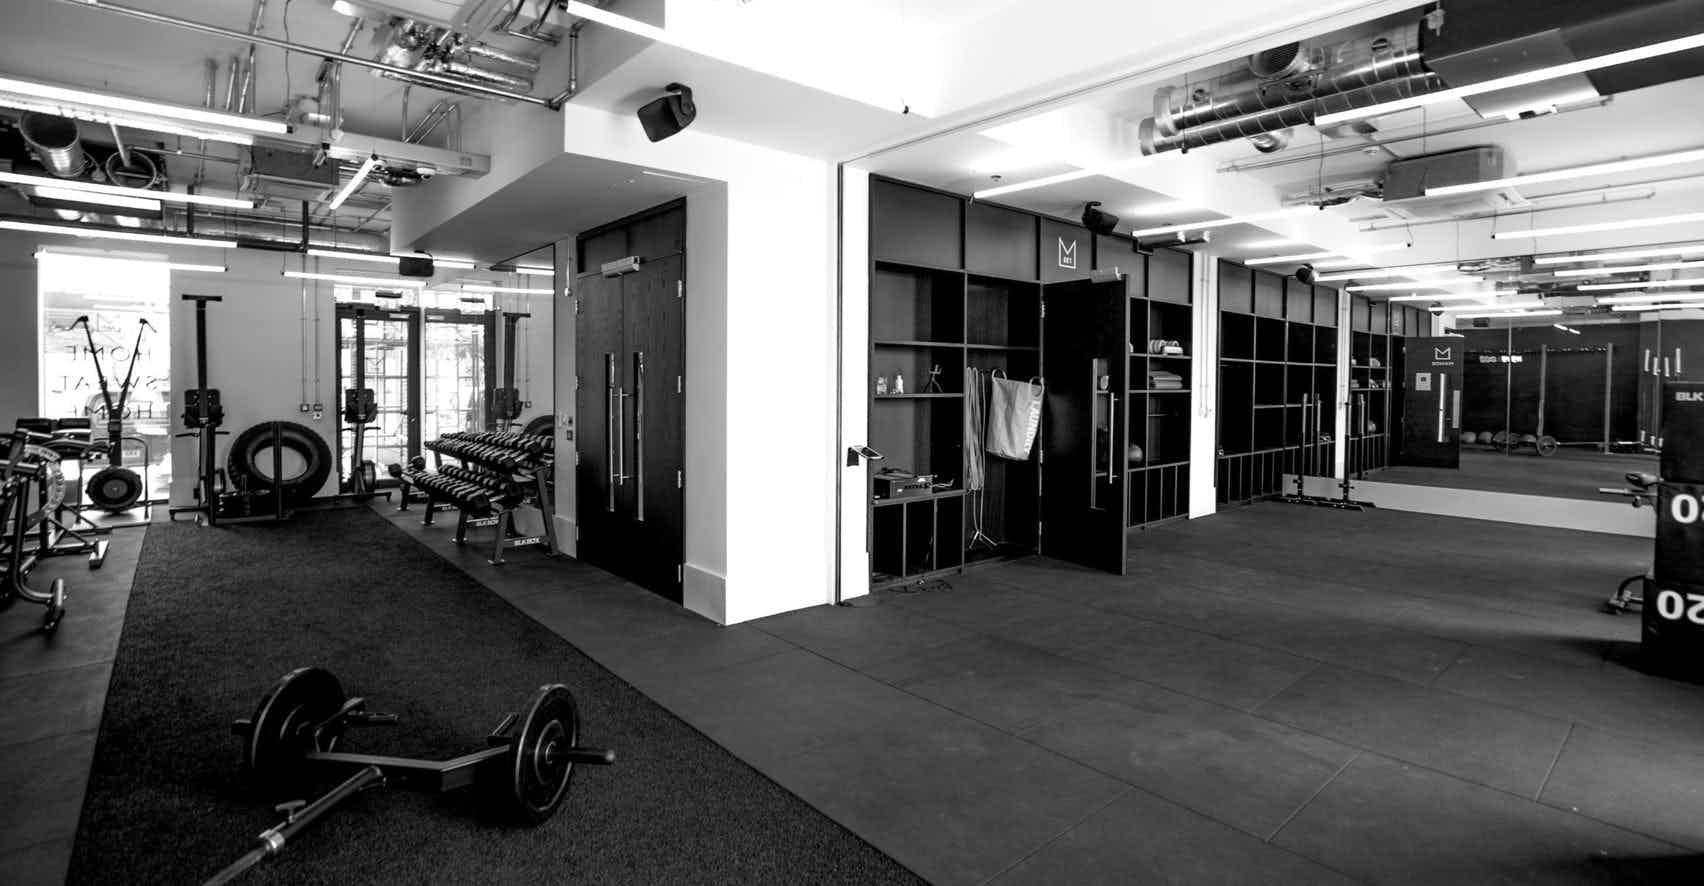 Manor se1 a london studio for hire u2013 headbox